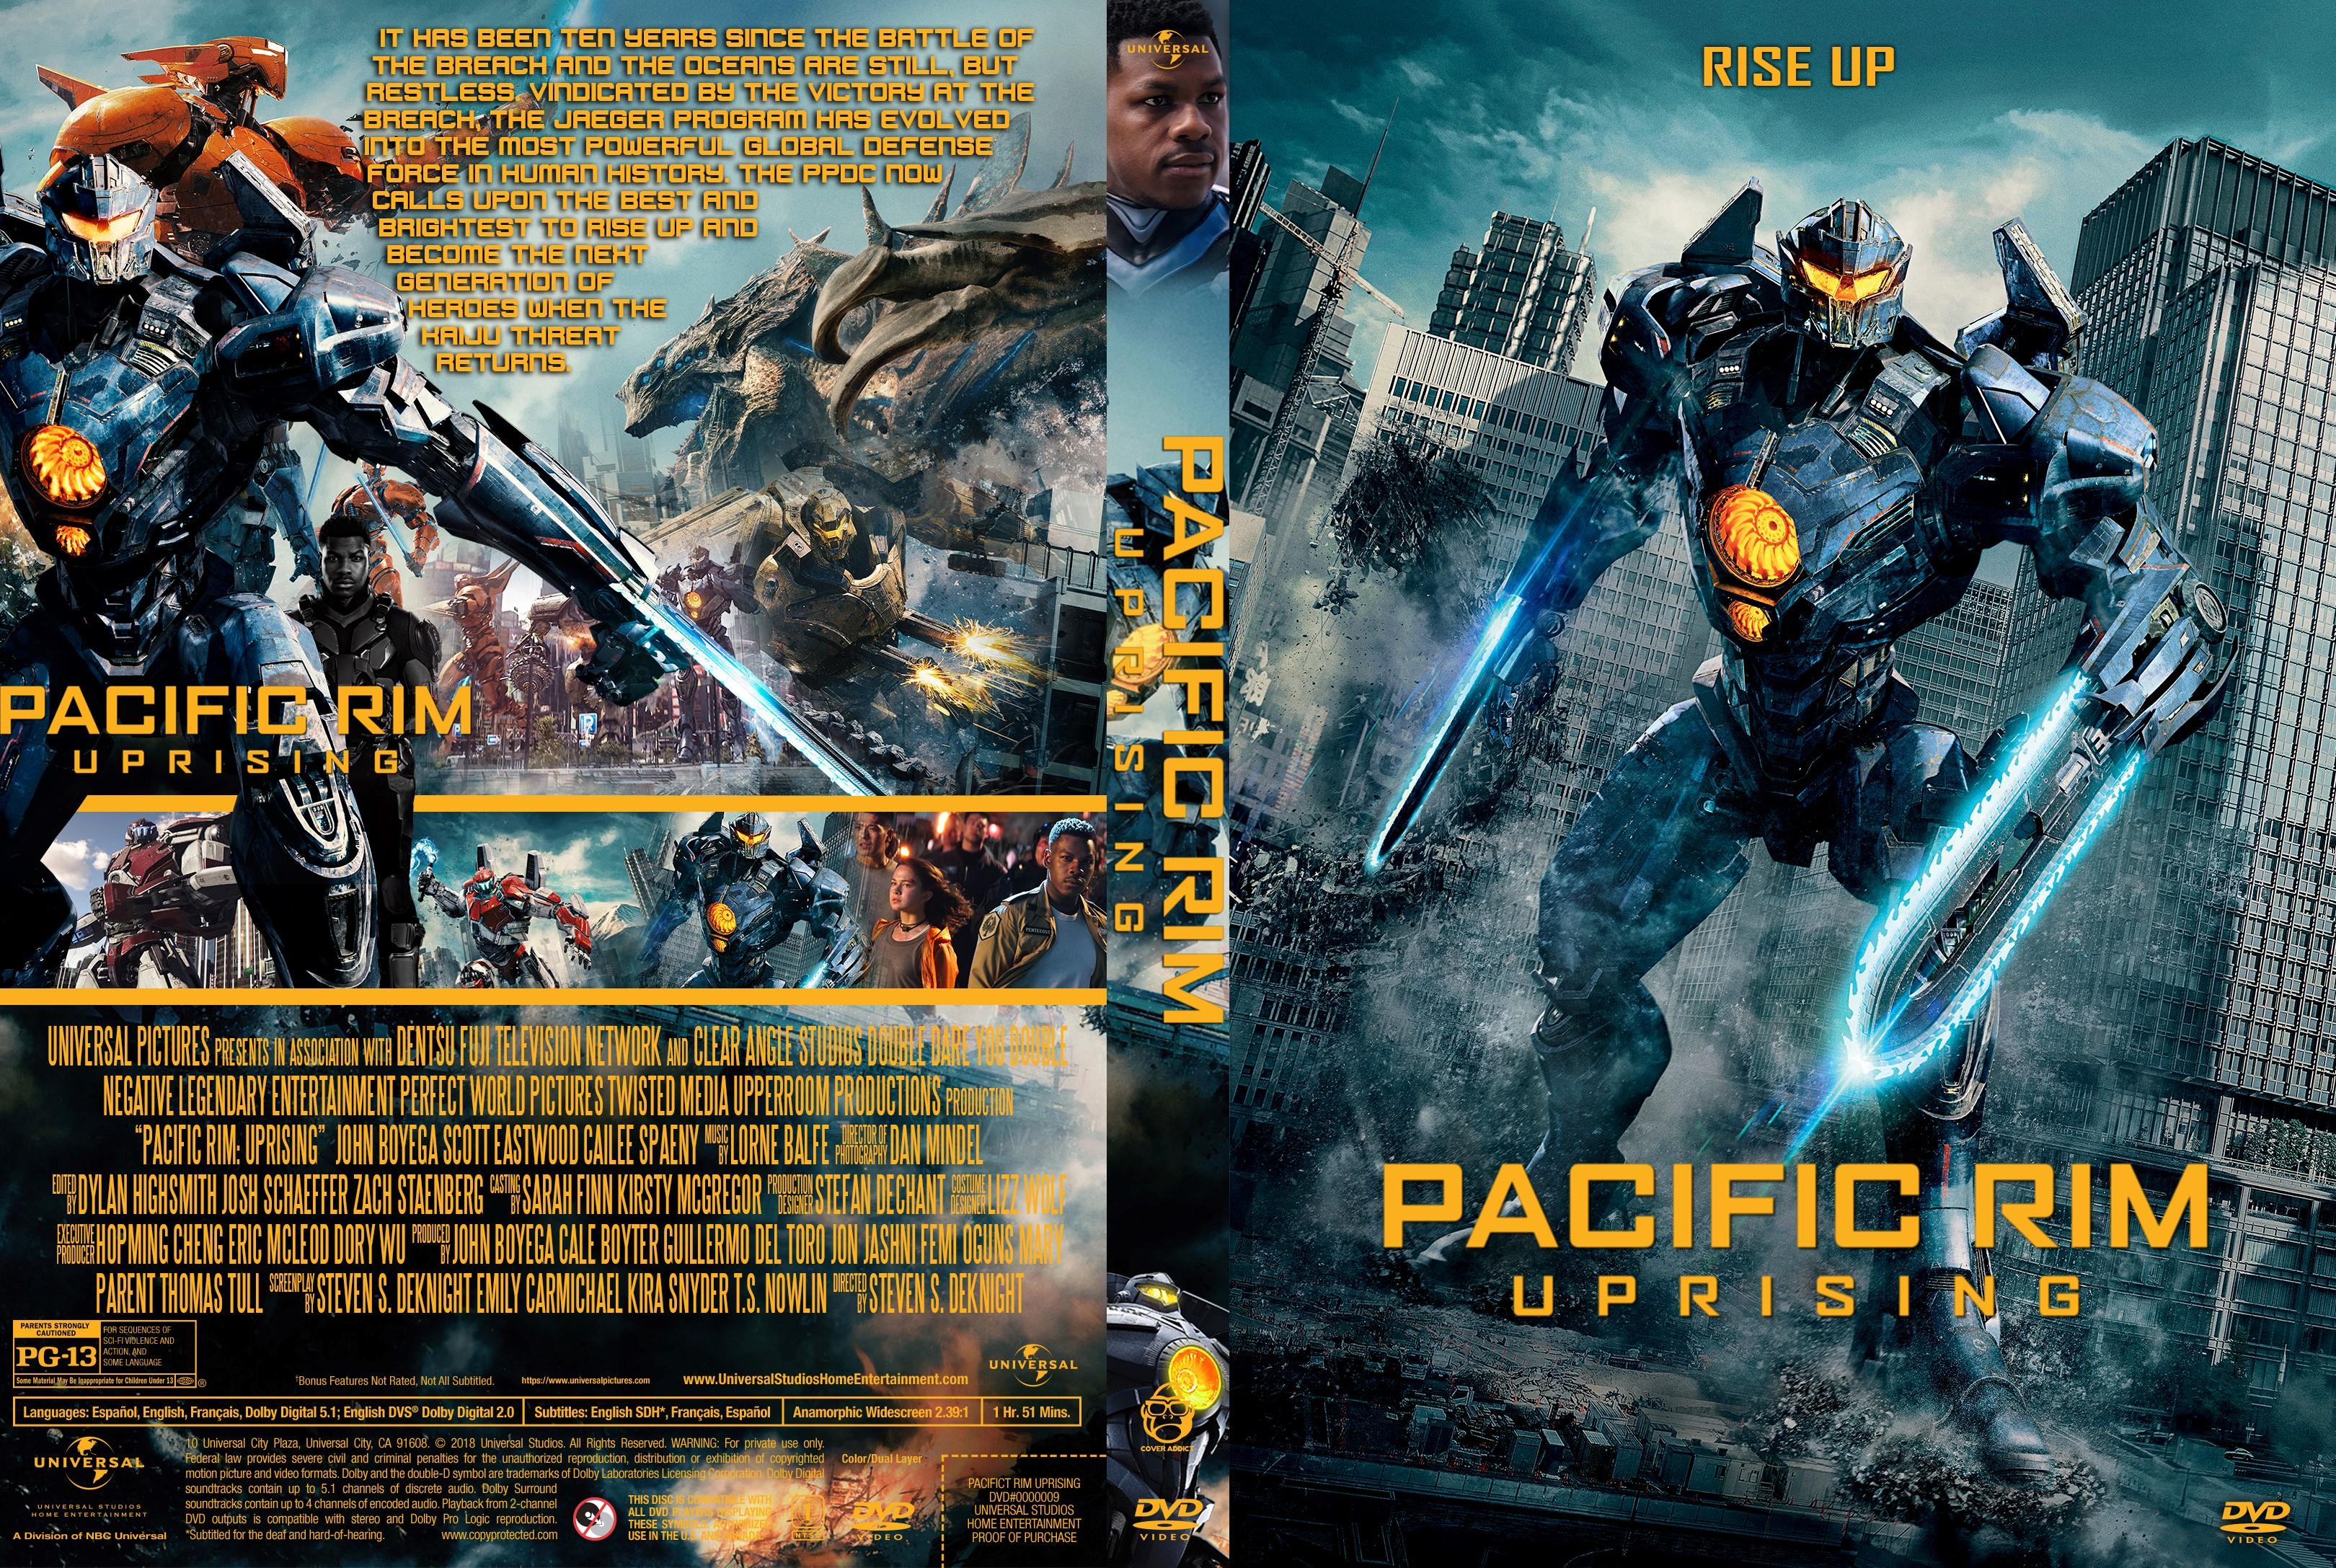 Pacific Rim Uprising DVD Cover | Cover Addict - Free DVD ... Pacific Rim Dvd Cover Art